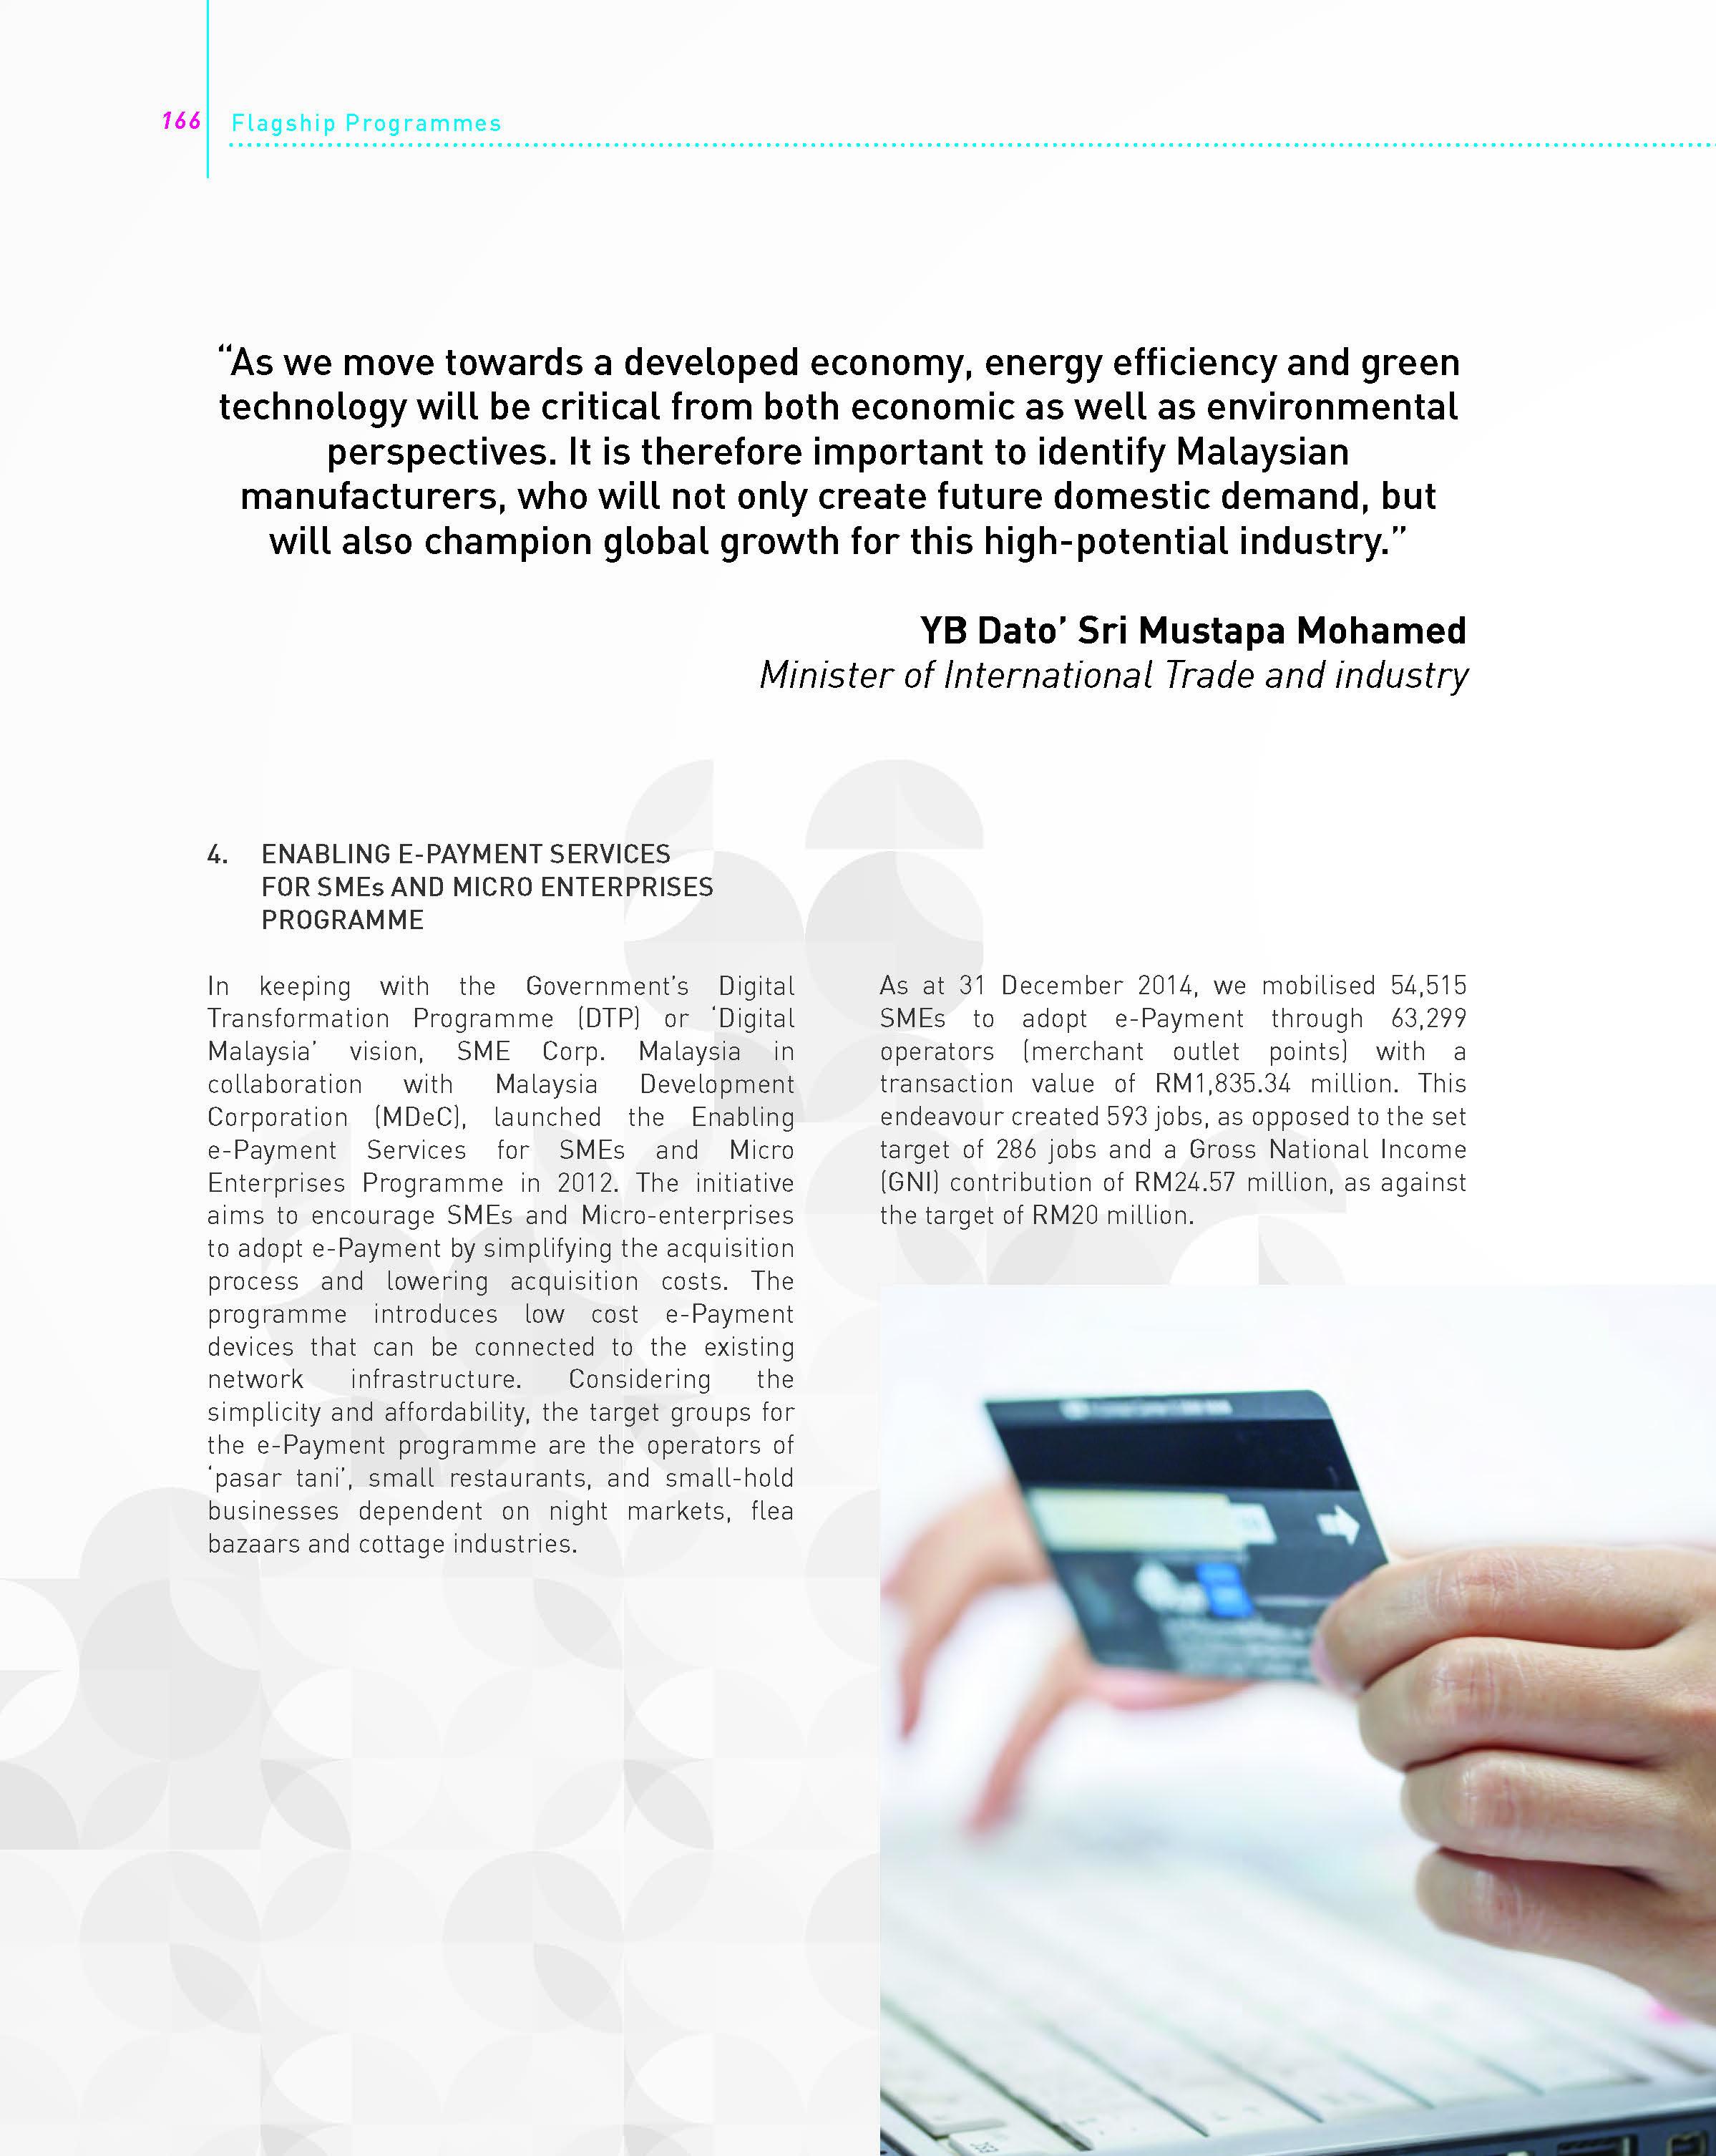 SME Corporation Malaysia - SME Corp  Malaysia Annual Reports